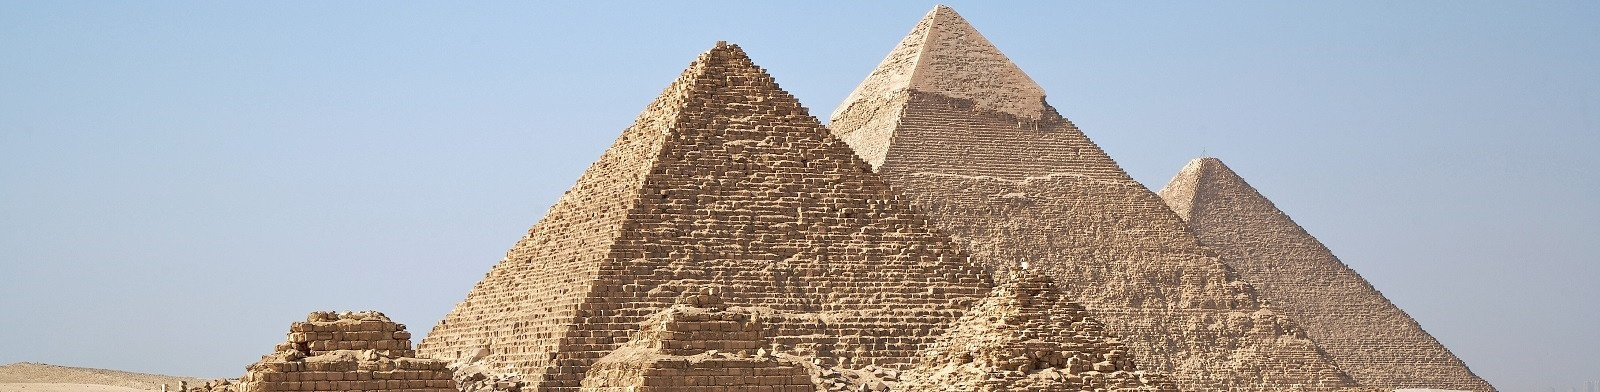 Pyramids, Cairo